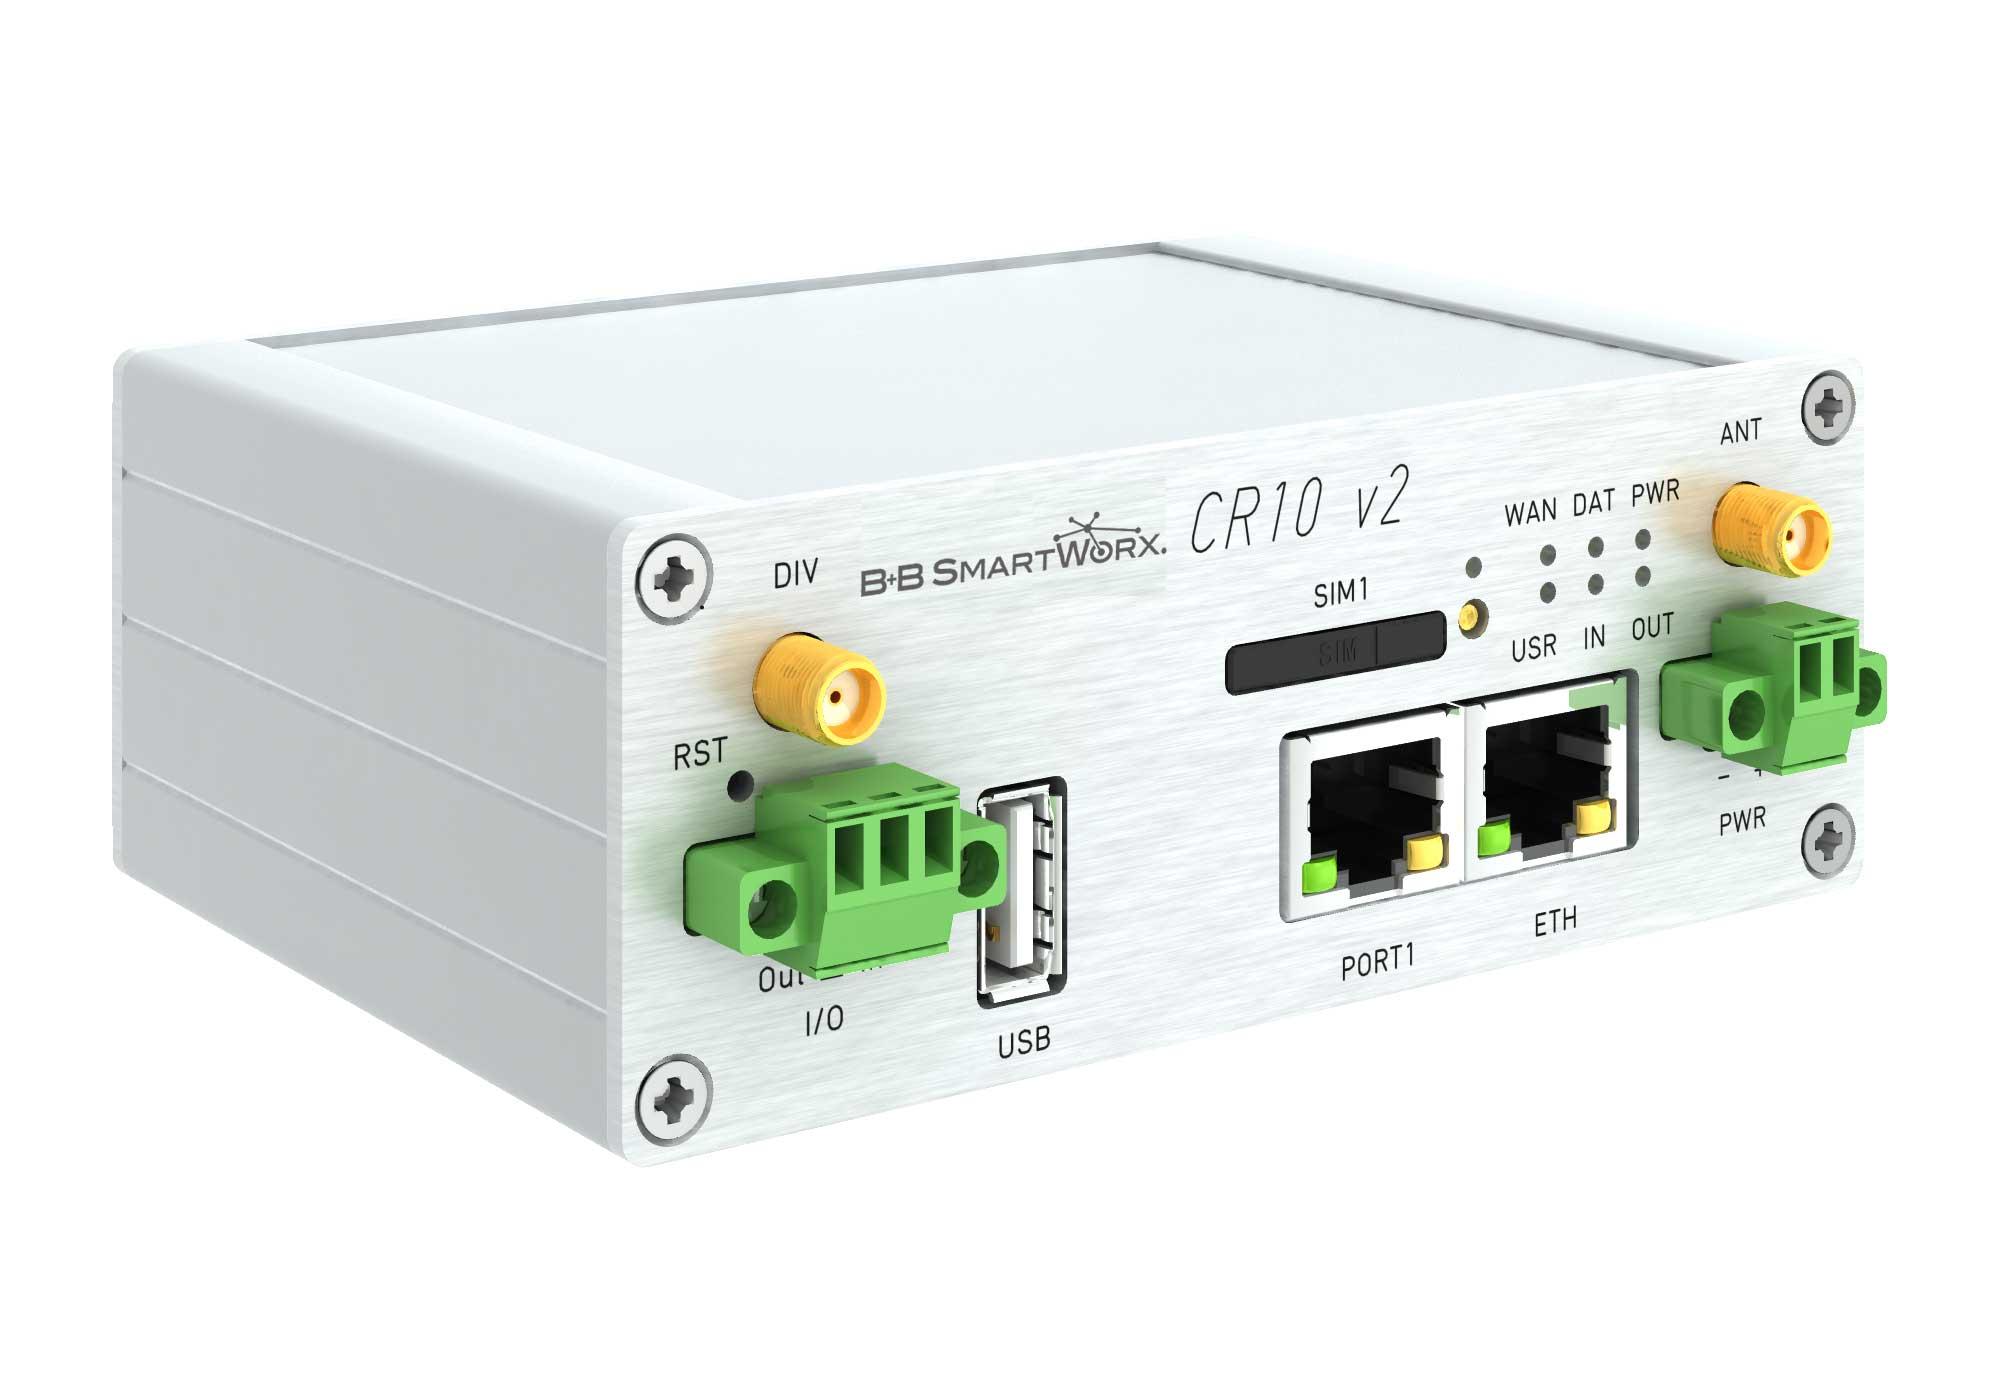 CDMA ROUTER CR10 V2